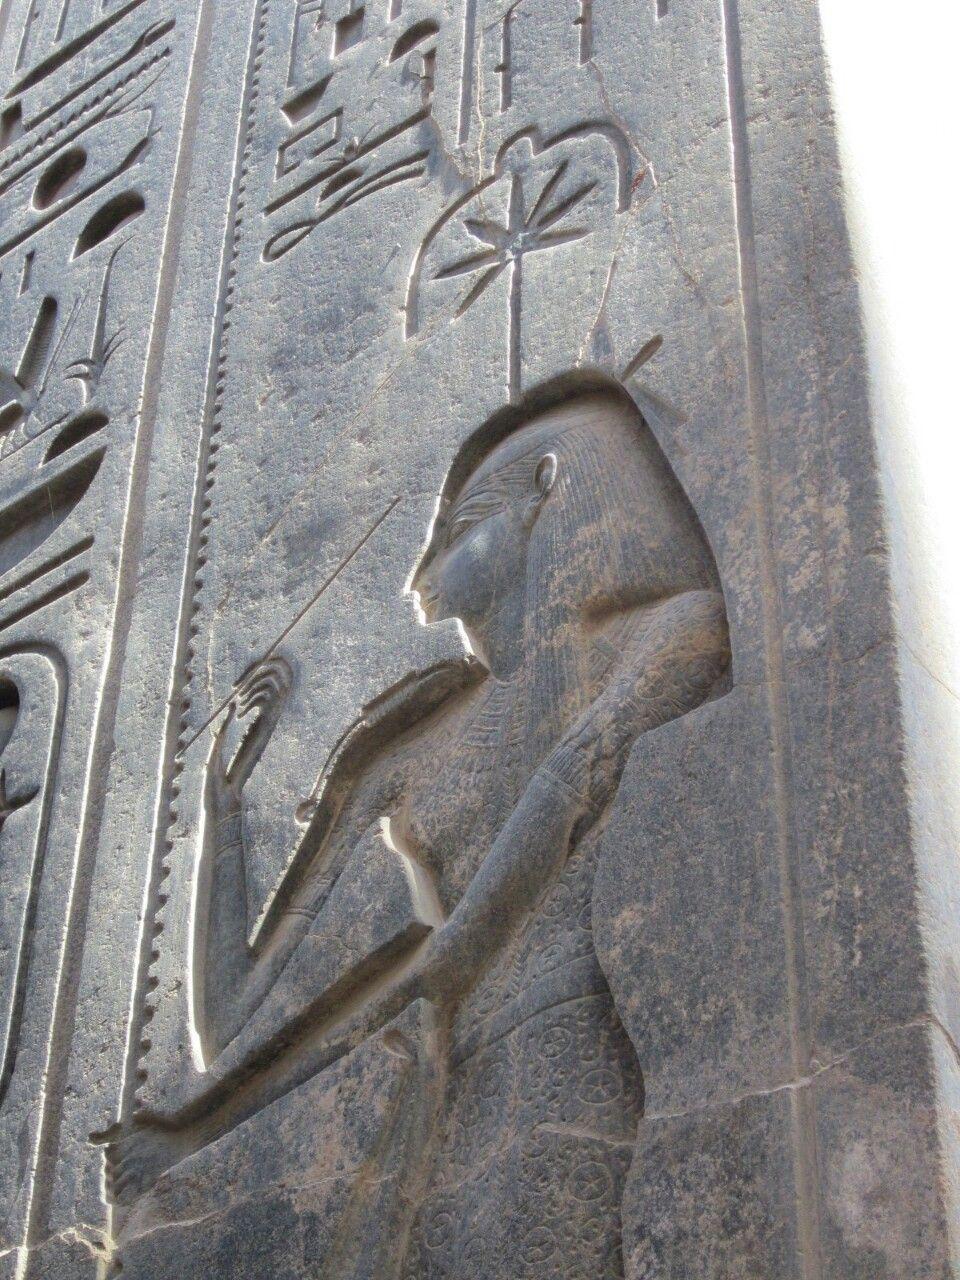 Seshat, the goddess of writing… Photo taken in Luxor temple